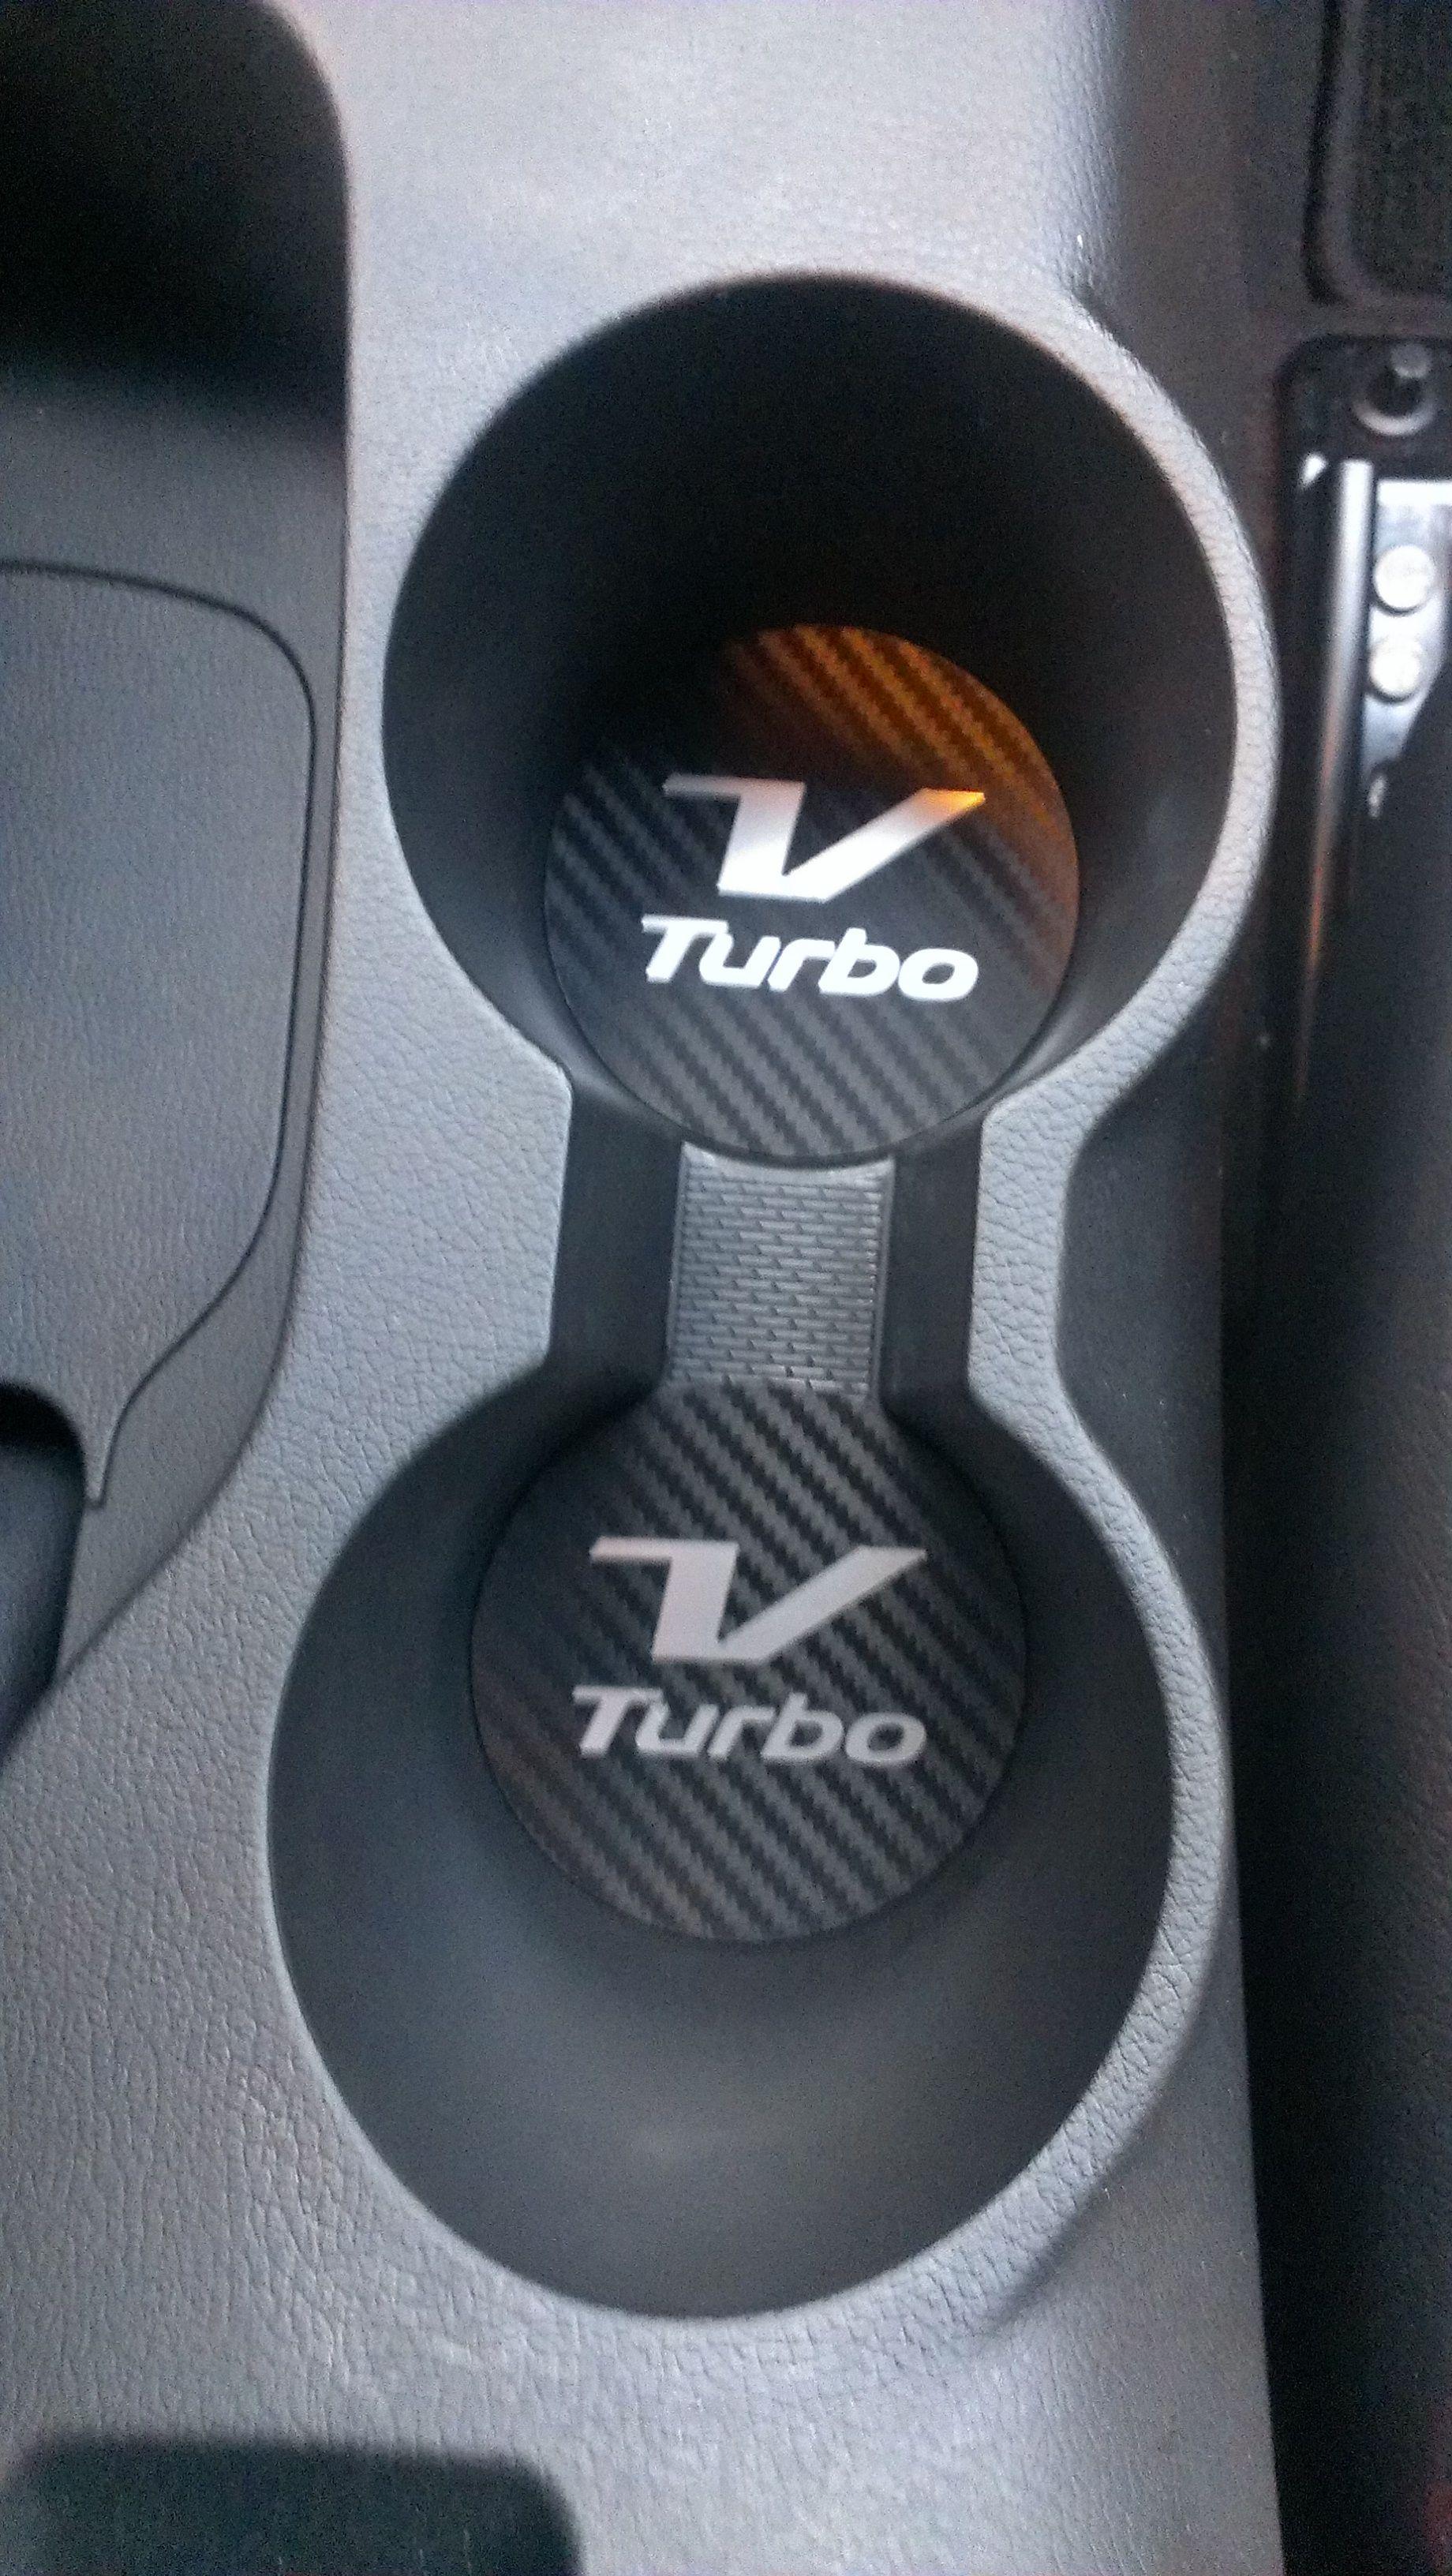 Pin by christine marcinek valdez on veloster baby - Hyundai veloster interior accessories ...